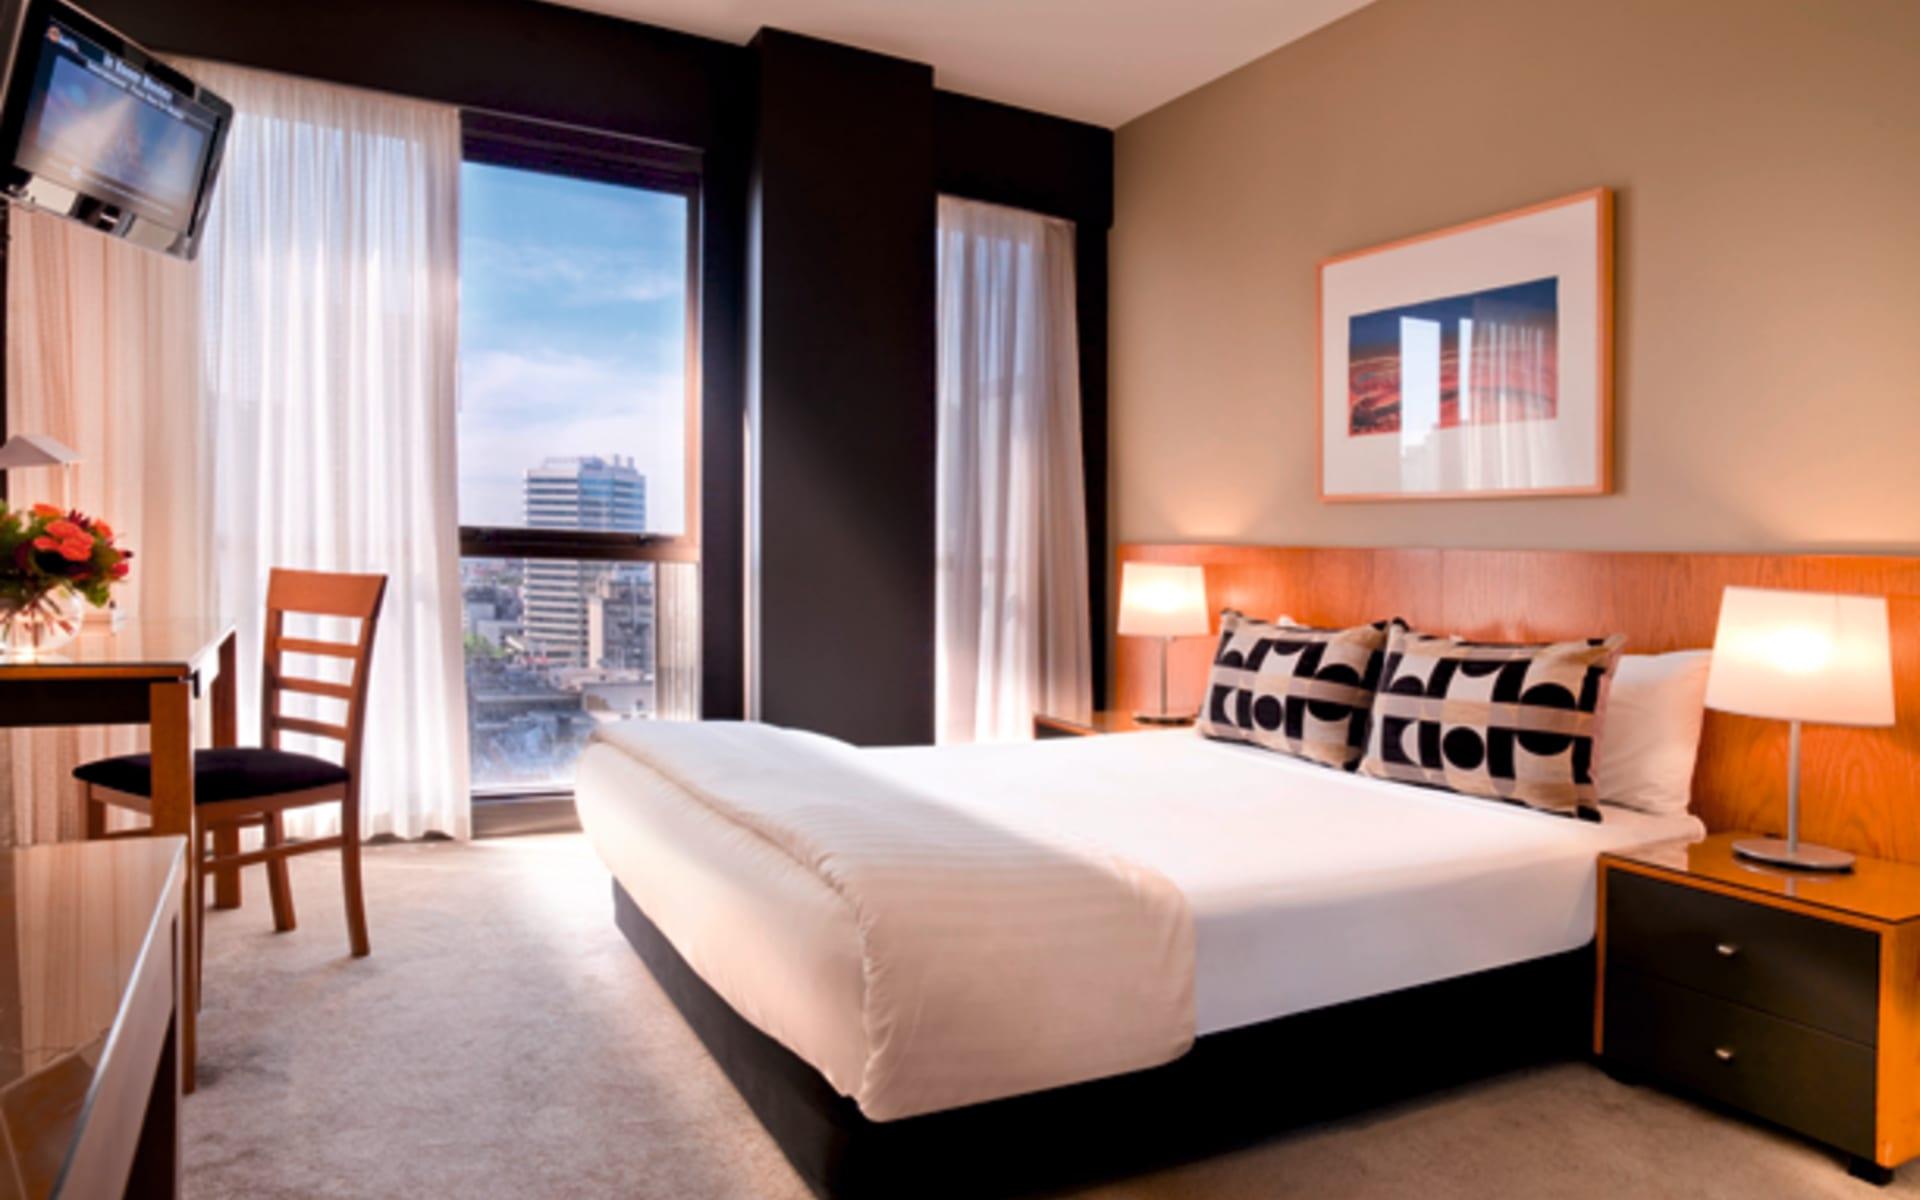 Adina Apartment Hotel Melbourne:  Adina Apartment Hotel Melbourne - Standard Studio